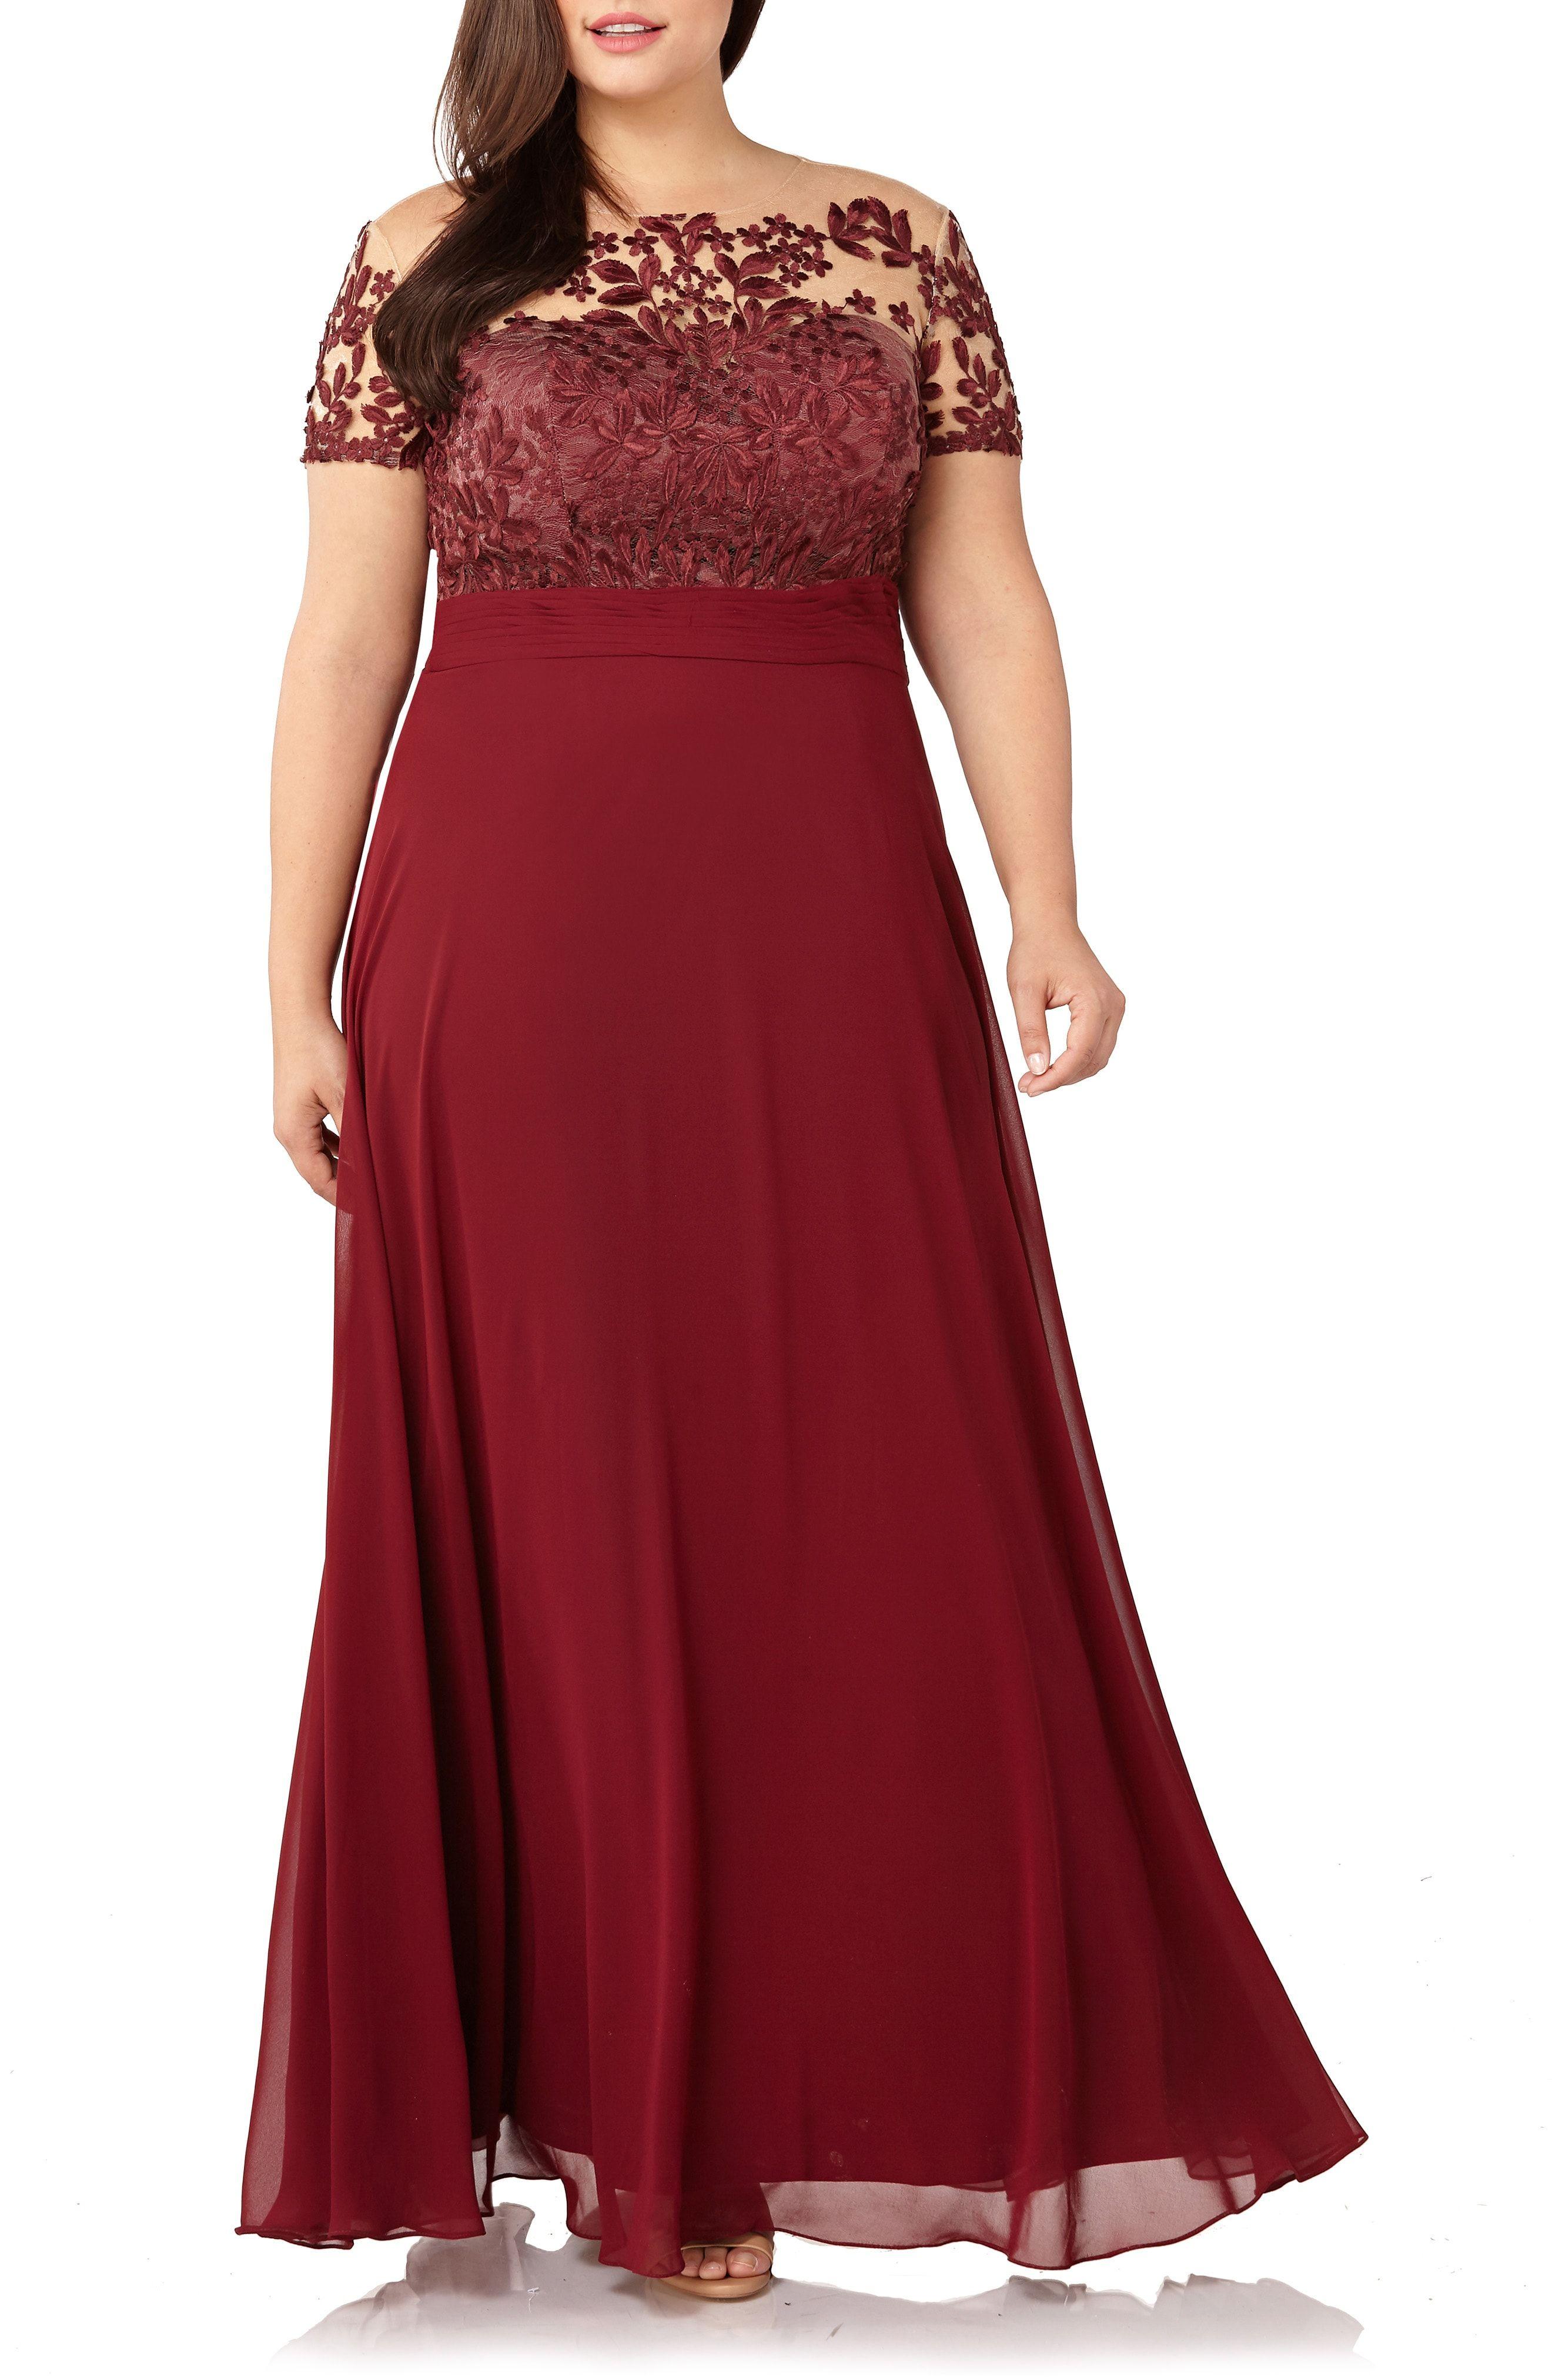 Stunning burgundy illusion gown for MotheroftheBride